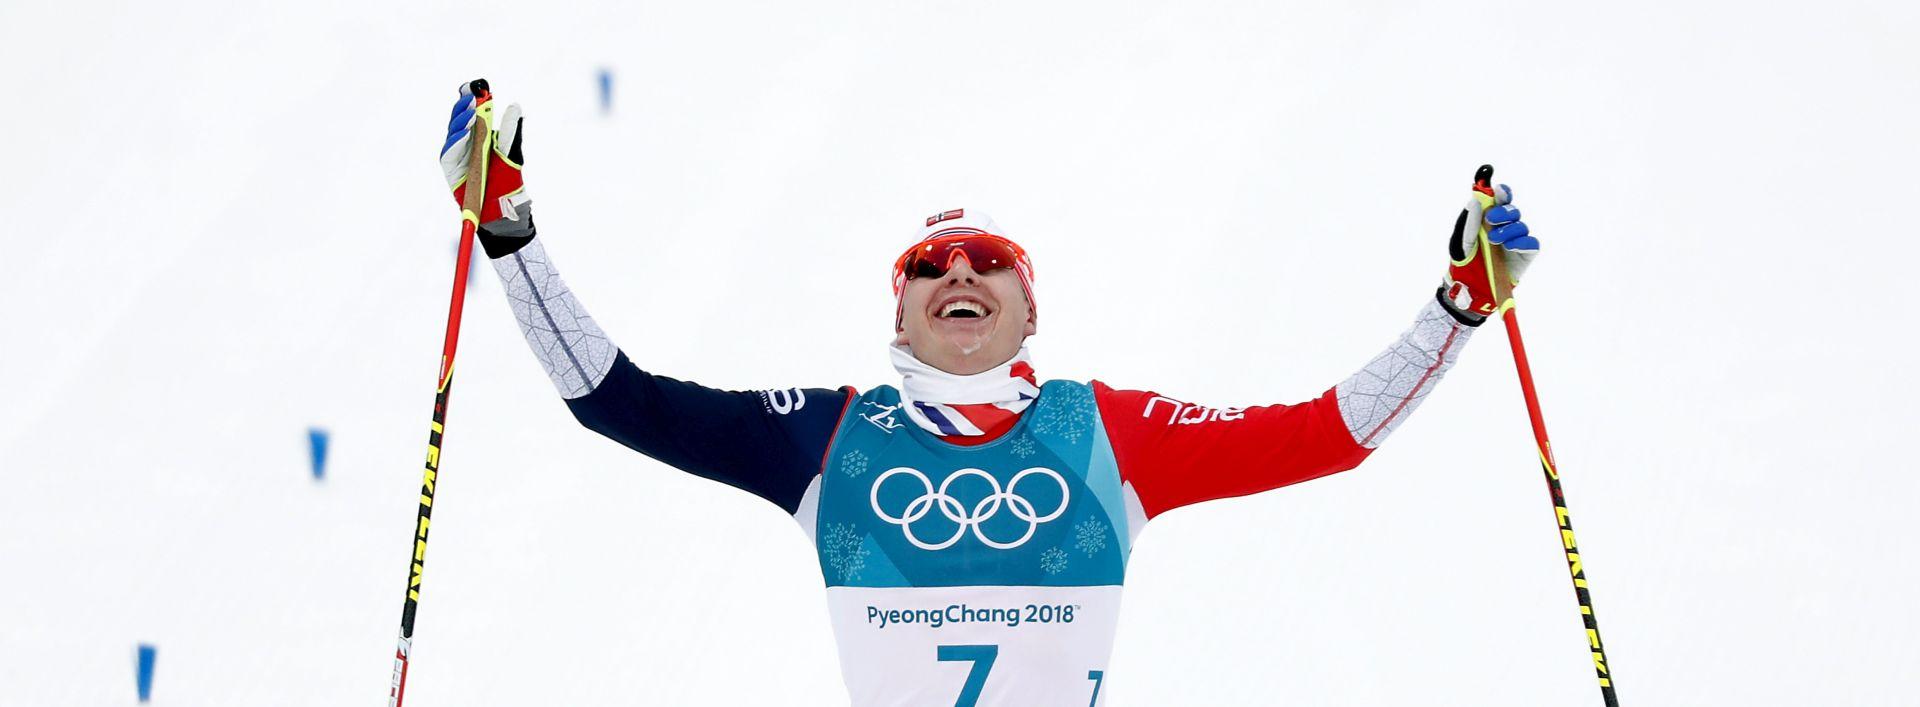 ZOI 2018: Krueger okrunio norvešku dominaciju u skiatlonu, Crnković 53., Dadić odustao